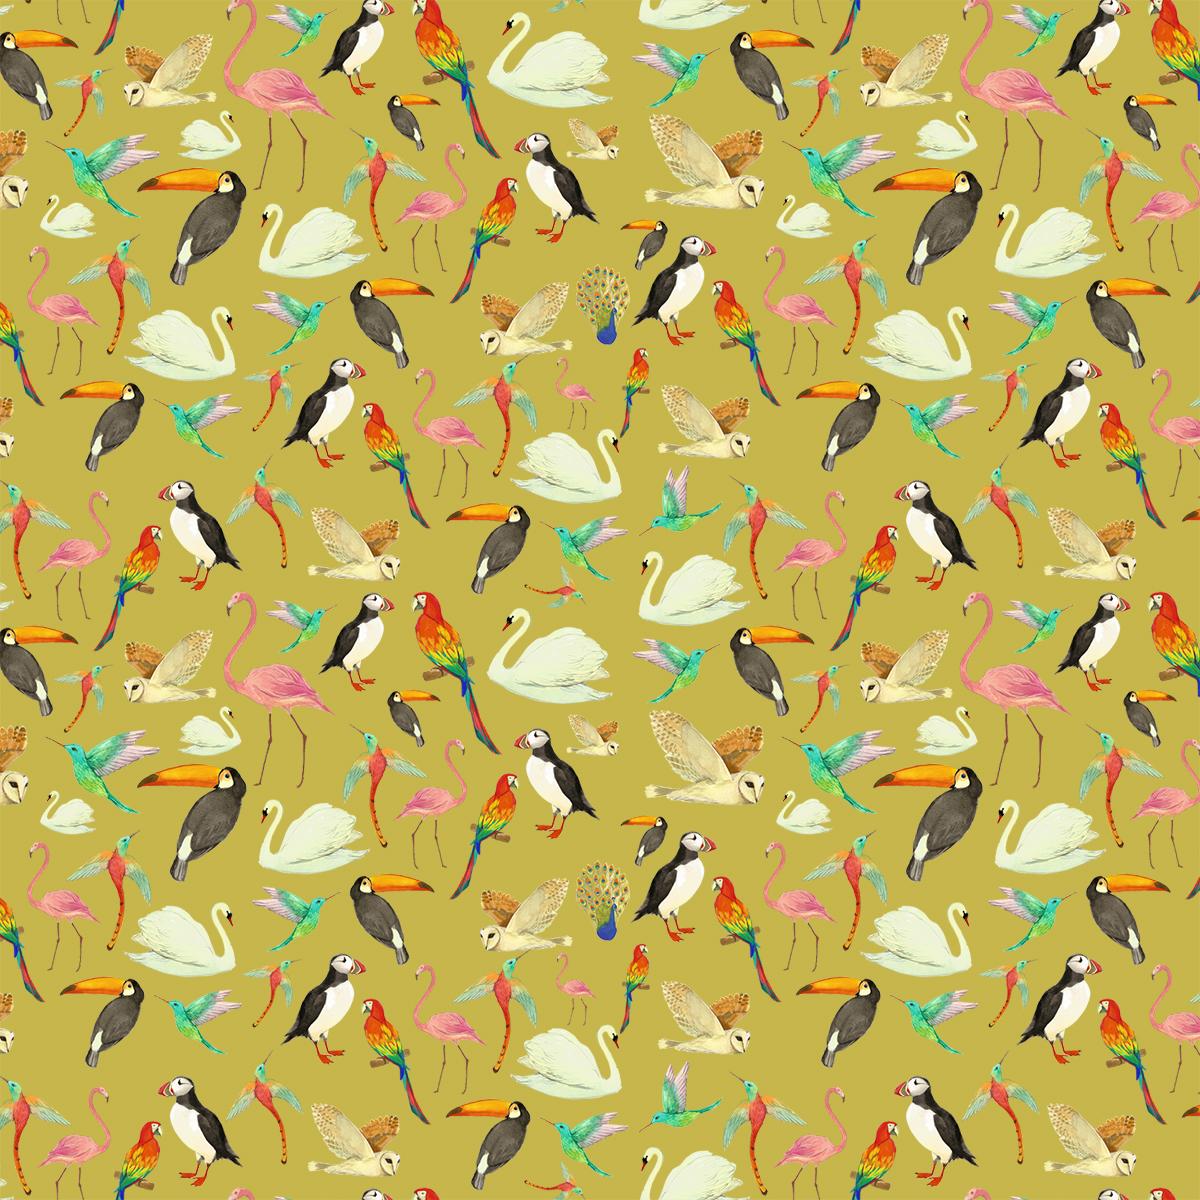 bird pattern yellow background melissa launay